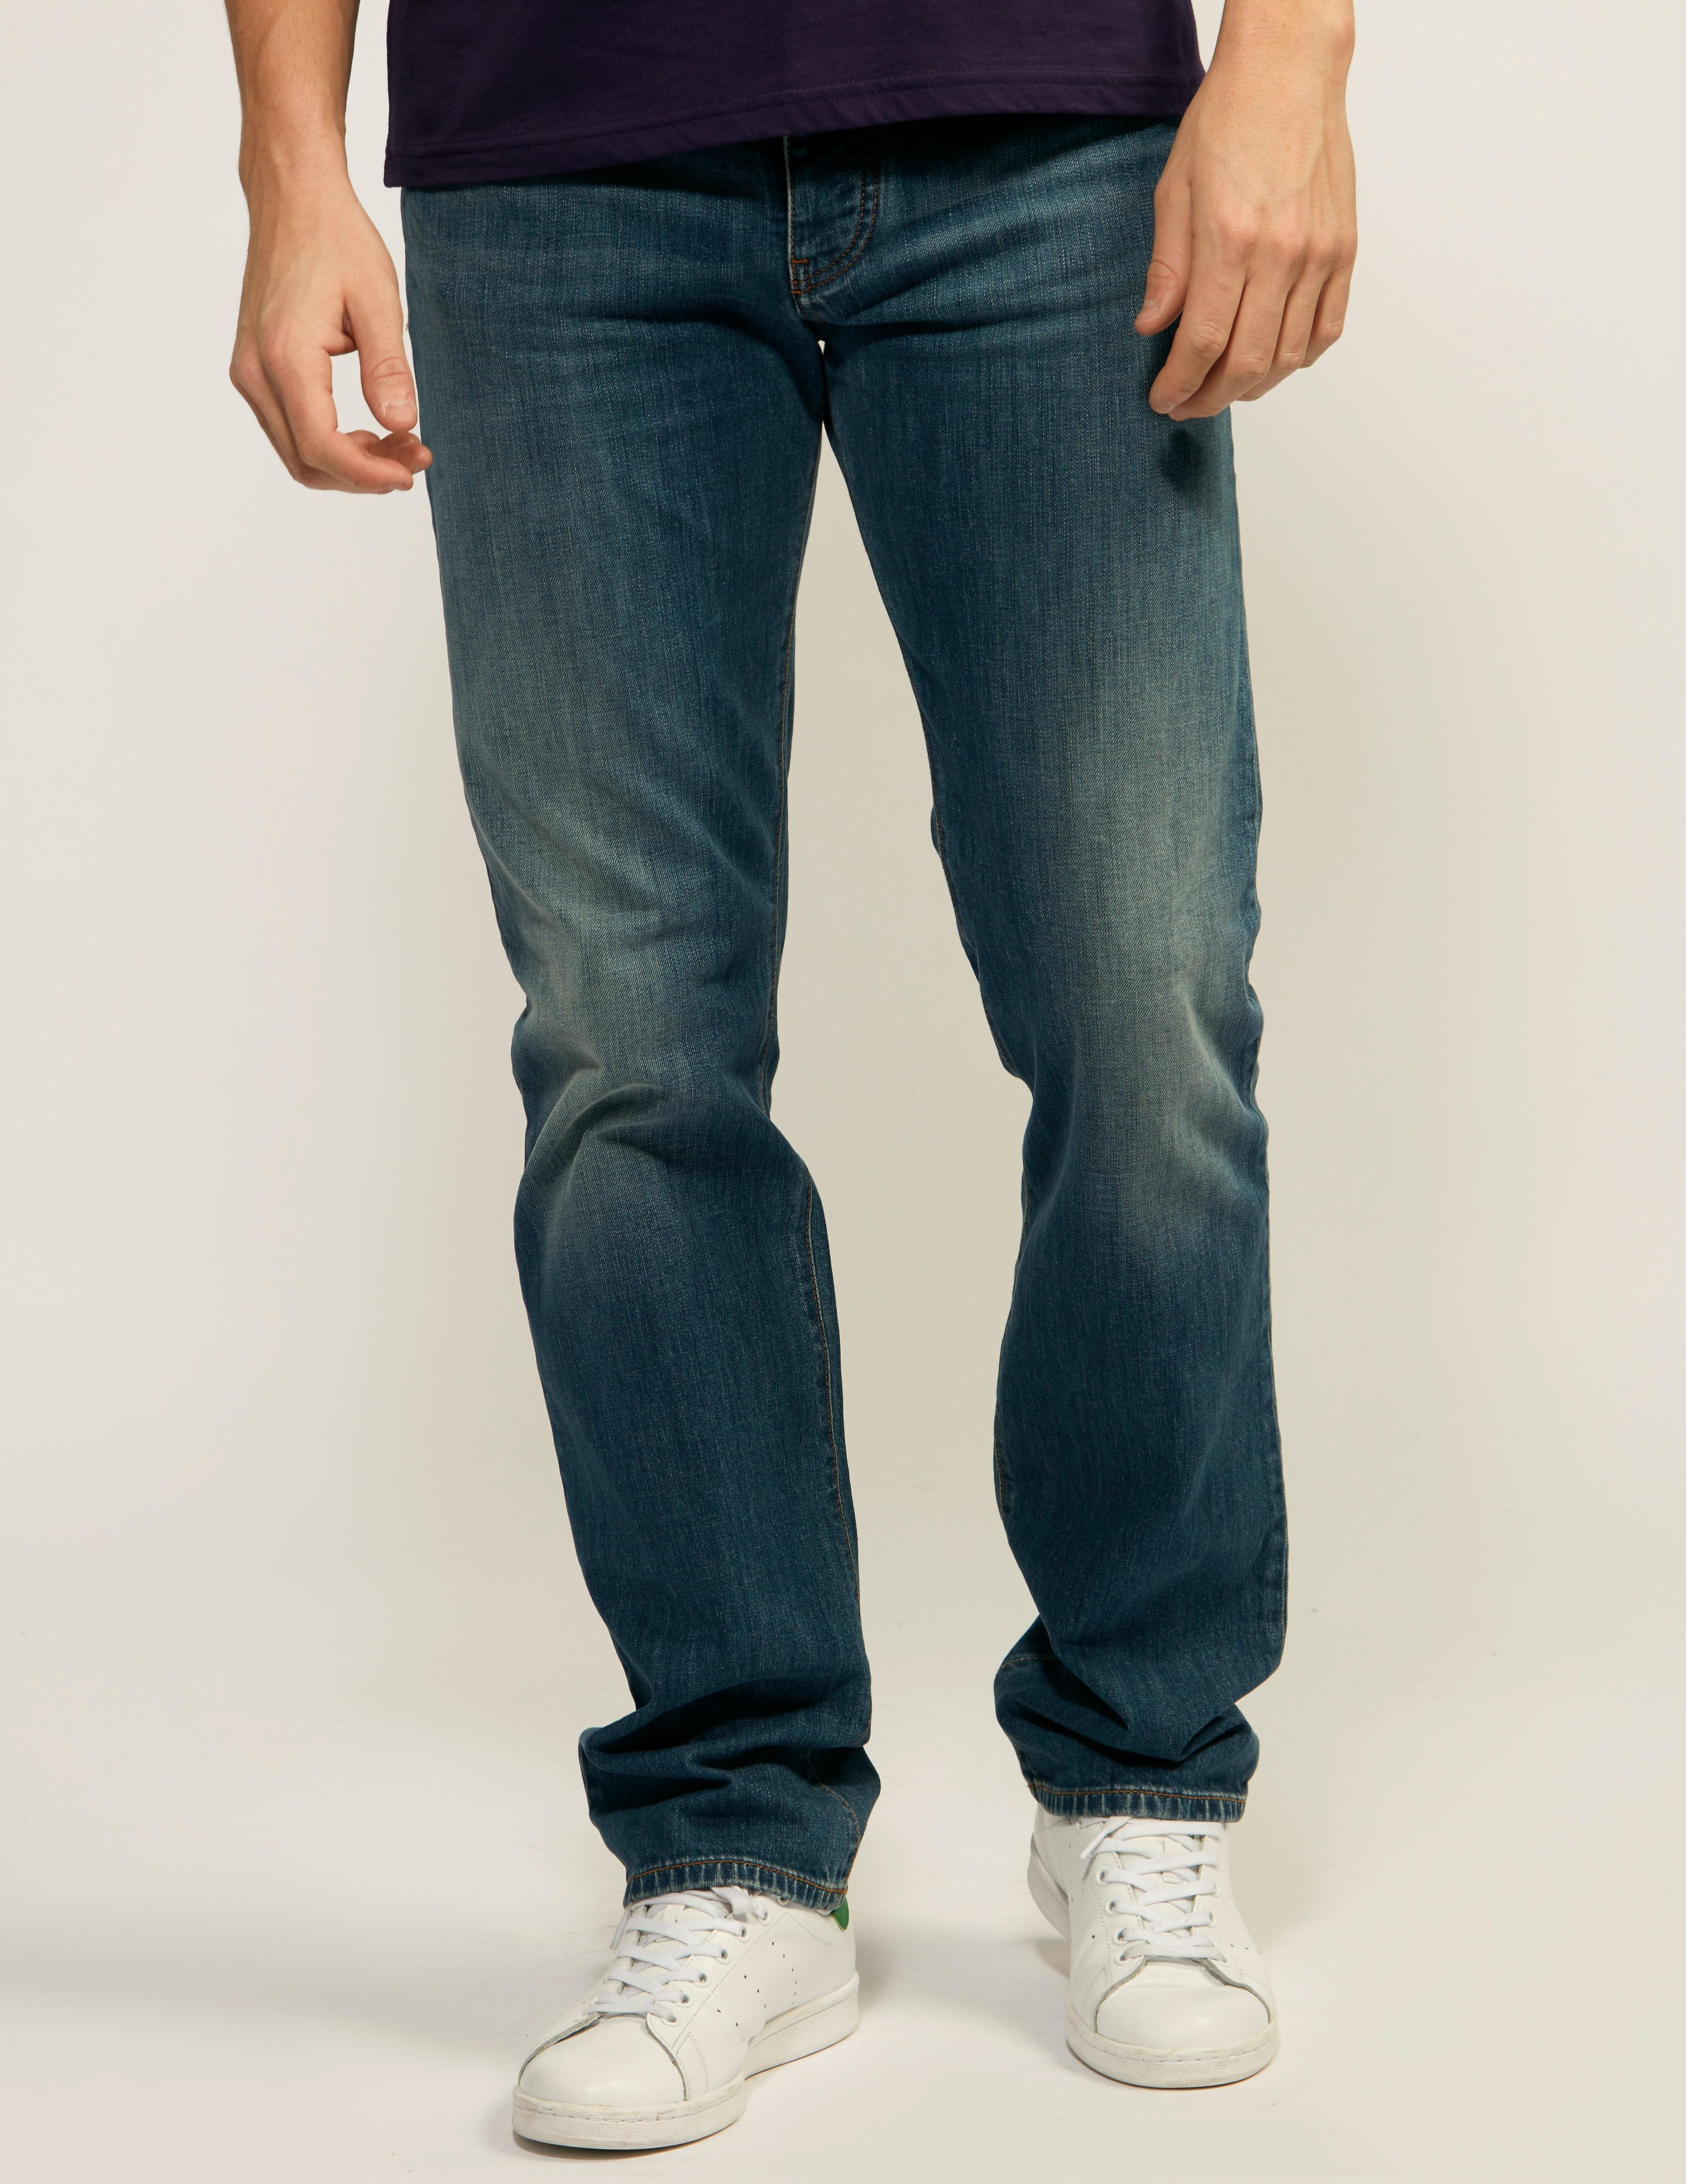 Armani Jeans J21 Stone Wash Regular Fit Jeans - Long